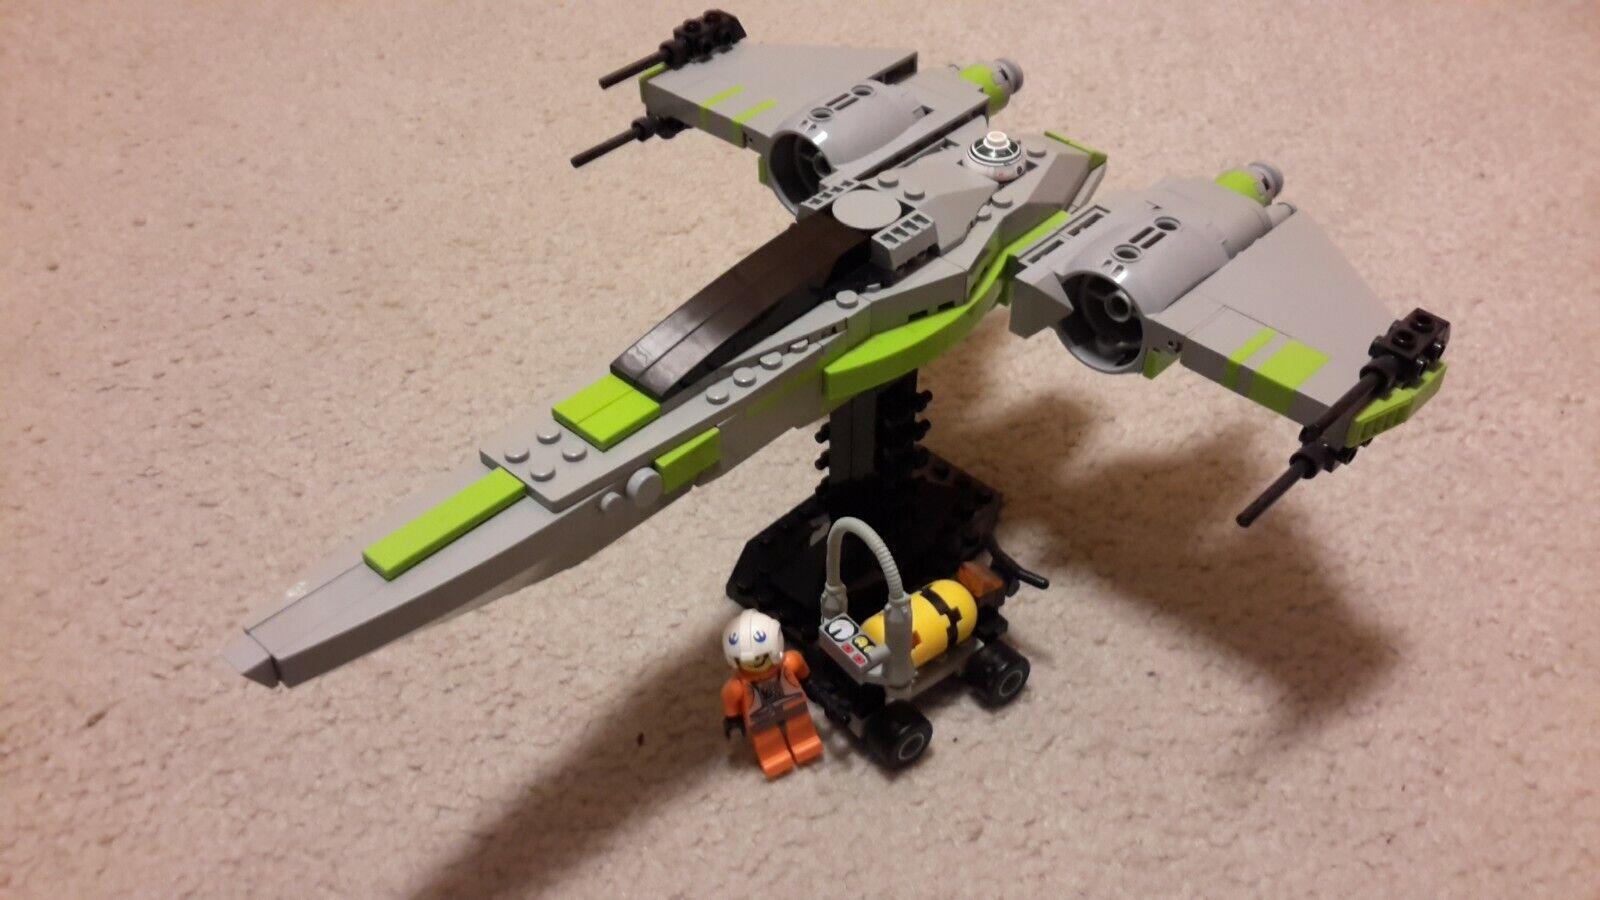 LEGO Custom Star Wars Experimental X-Wing + Pilot, Stand, Fuel cart - Lime Trim